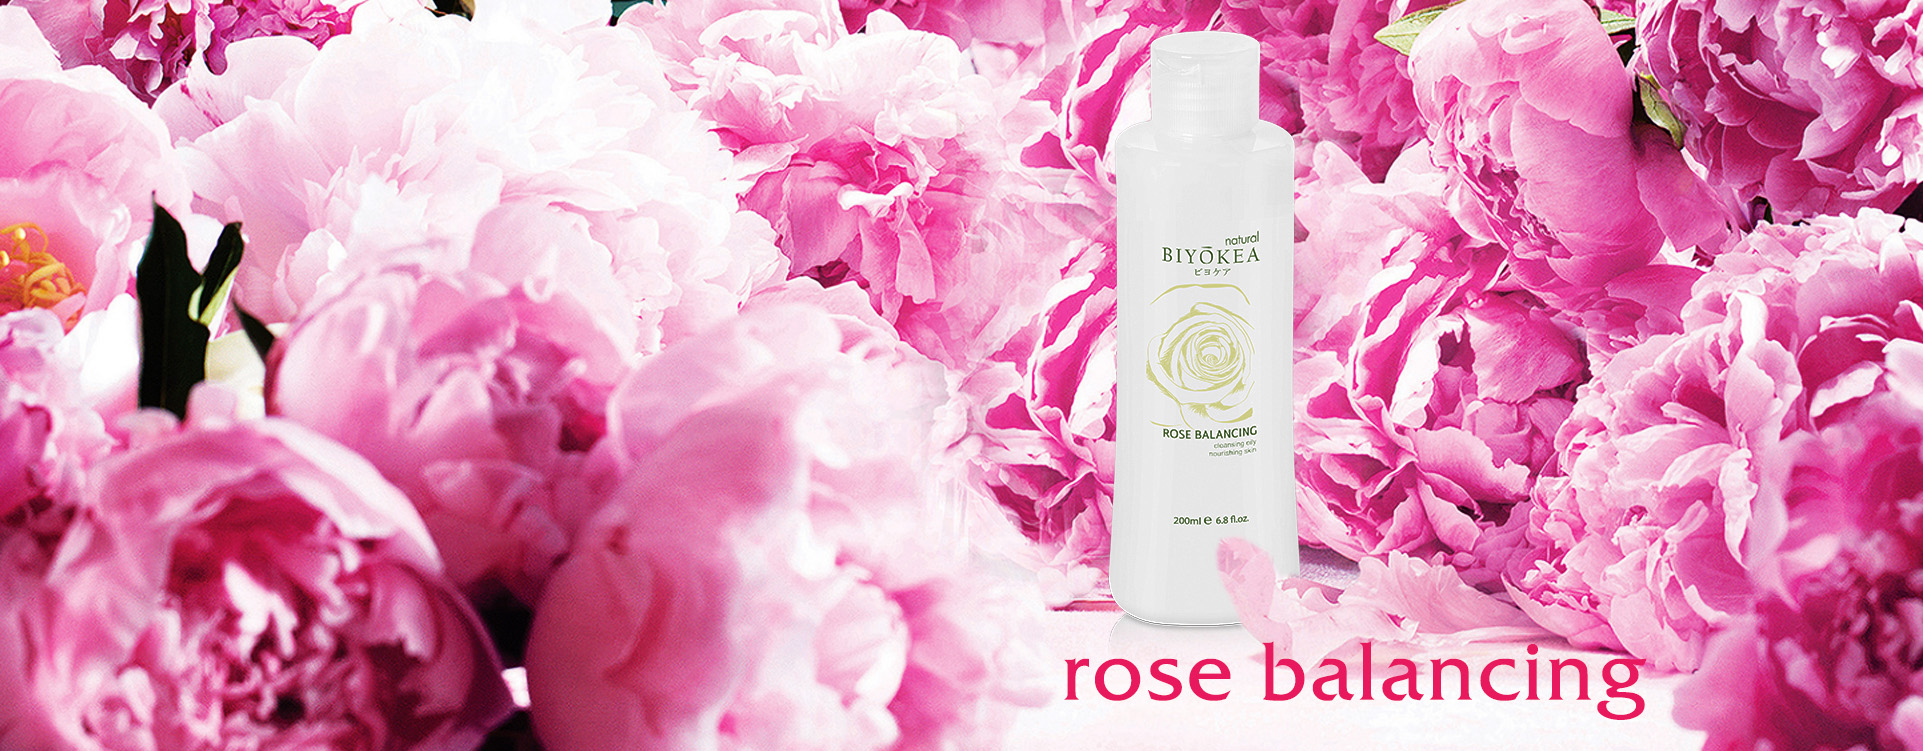 banner rose 1